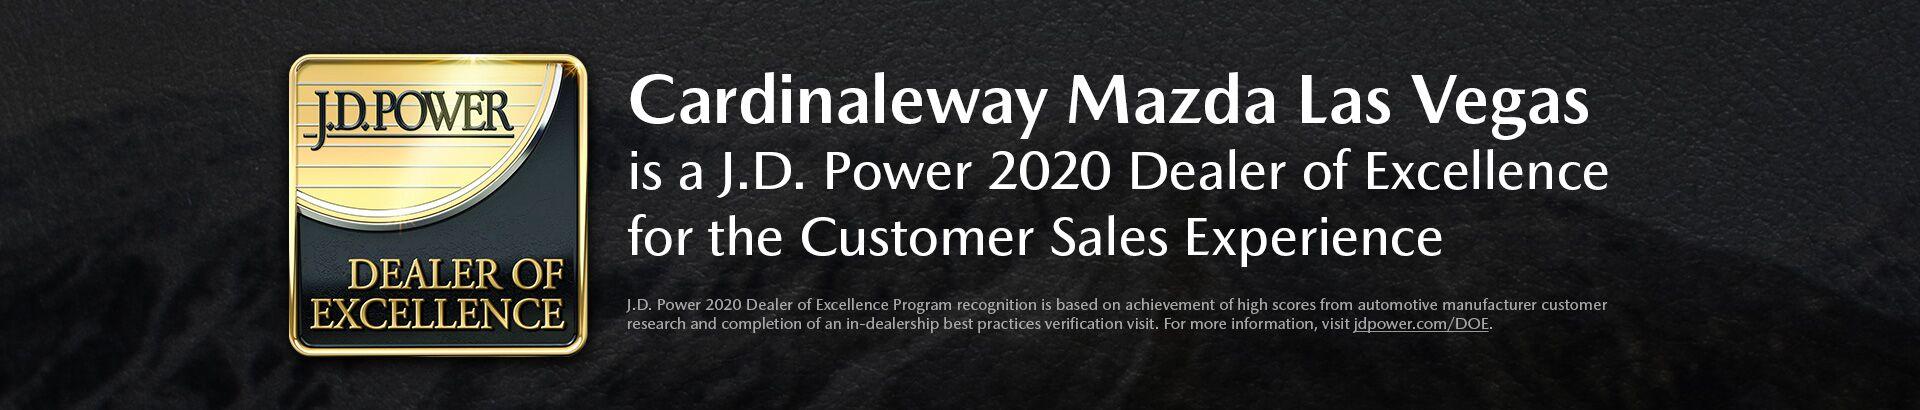 CardinaleWay Mazda Las Vegas JD Power Dealer of Excellence